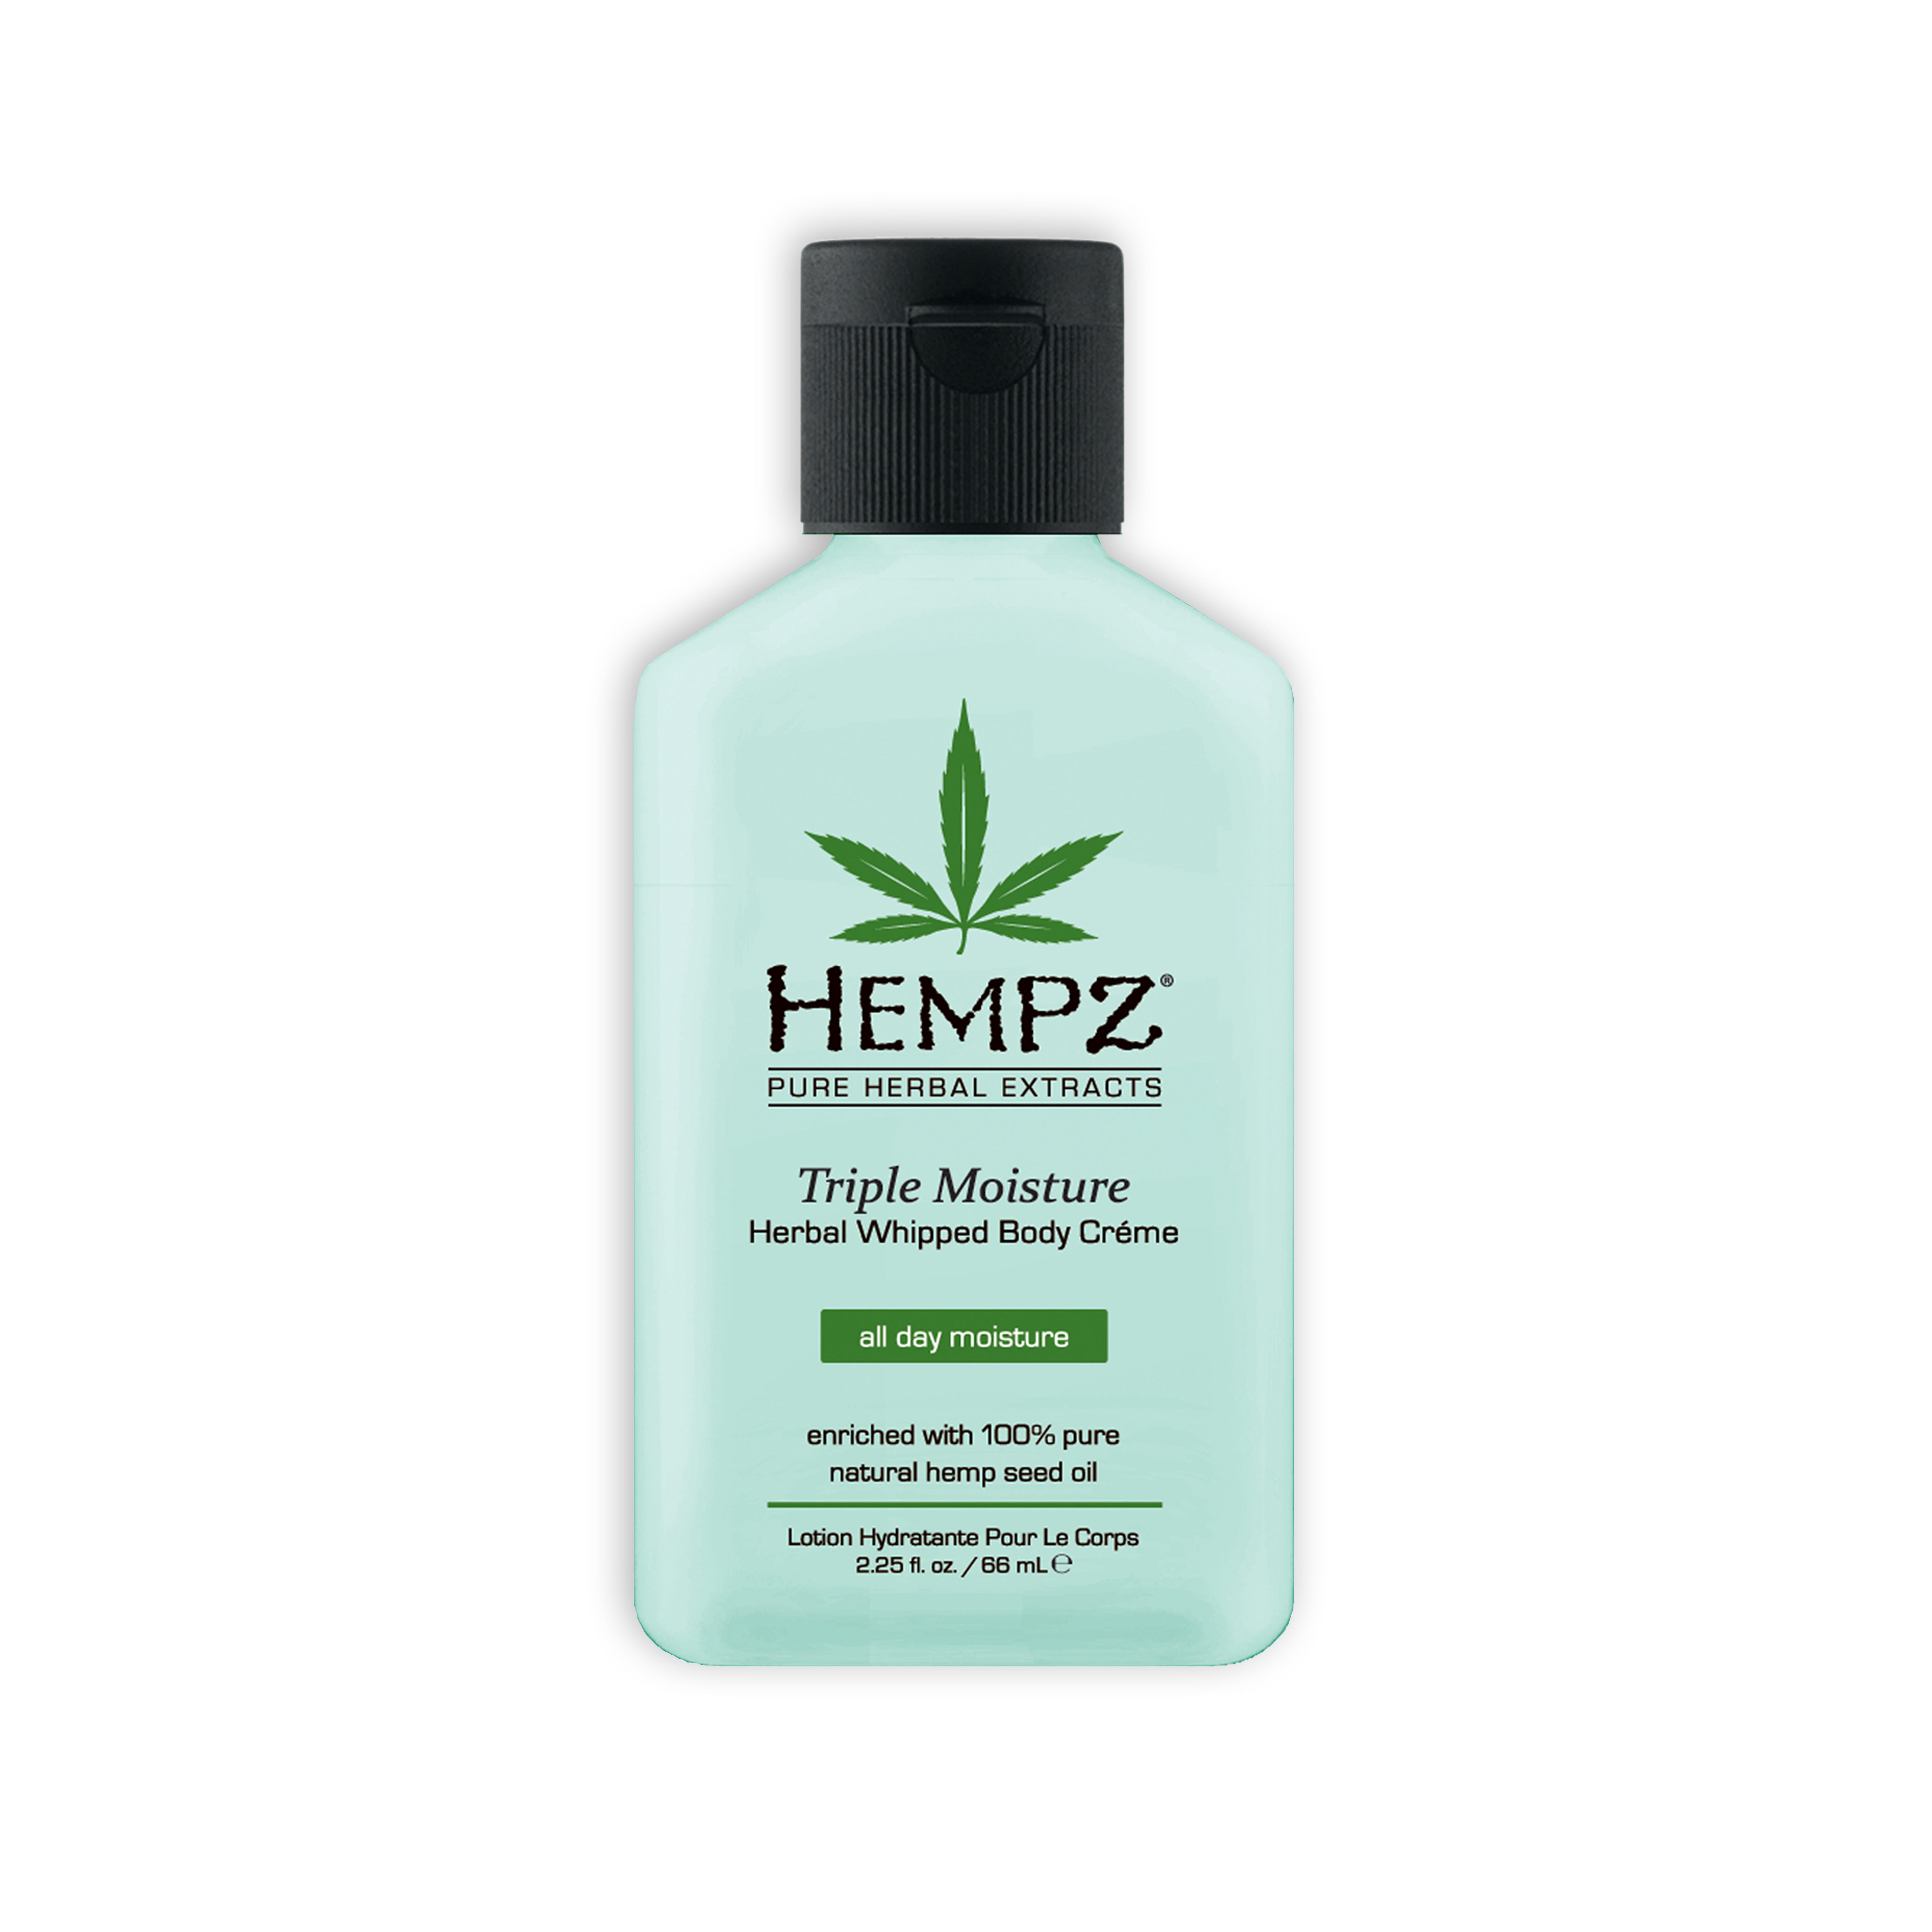 hempz triple moisture 66ml